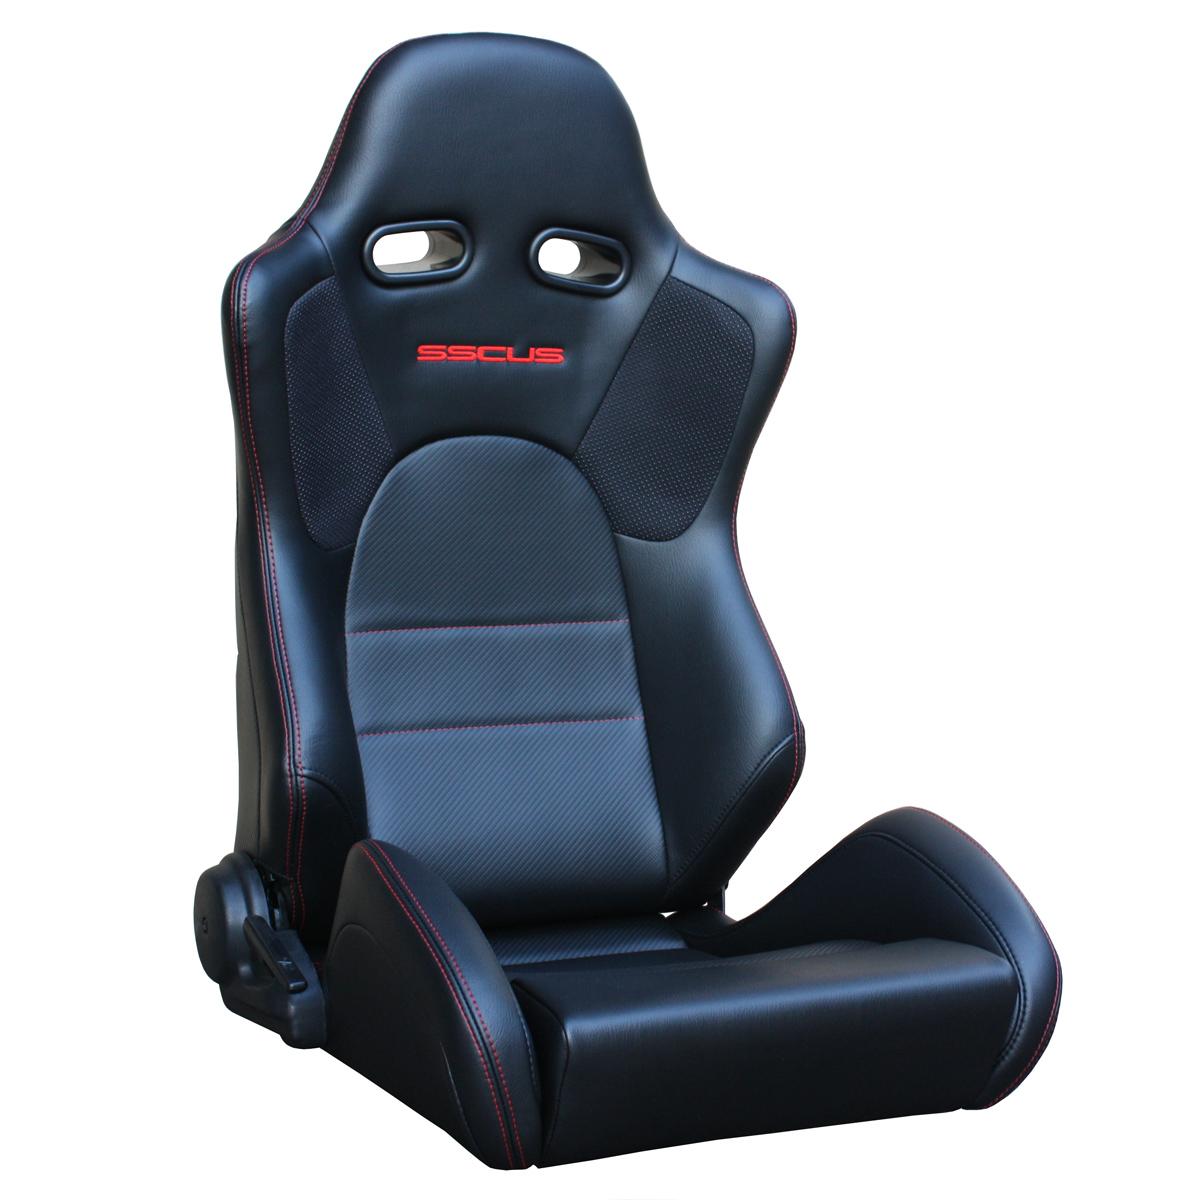 sport seat star 310 sscus. Black Bedroom Furniture Sets. Home Design Ideas